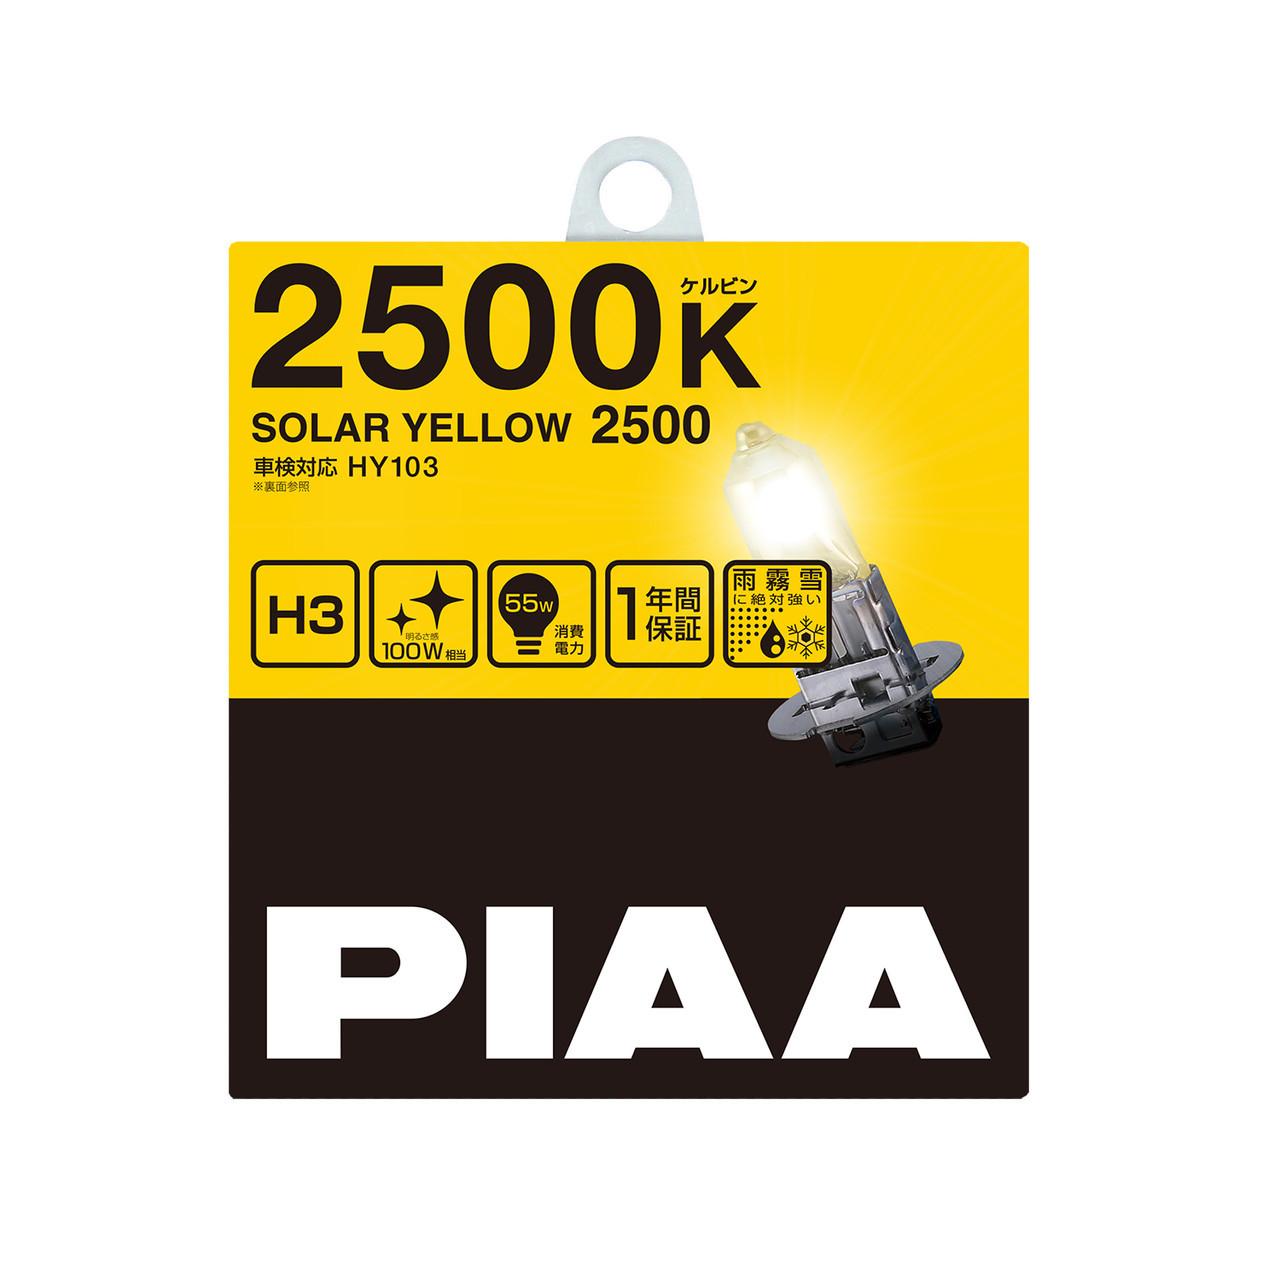 Автолампы PIAA SOLAR YELLOW  ☀ 2500K - желтый свет H3